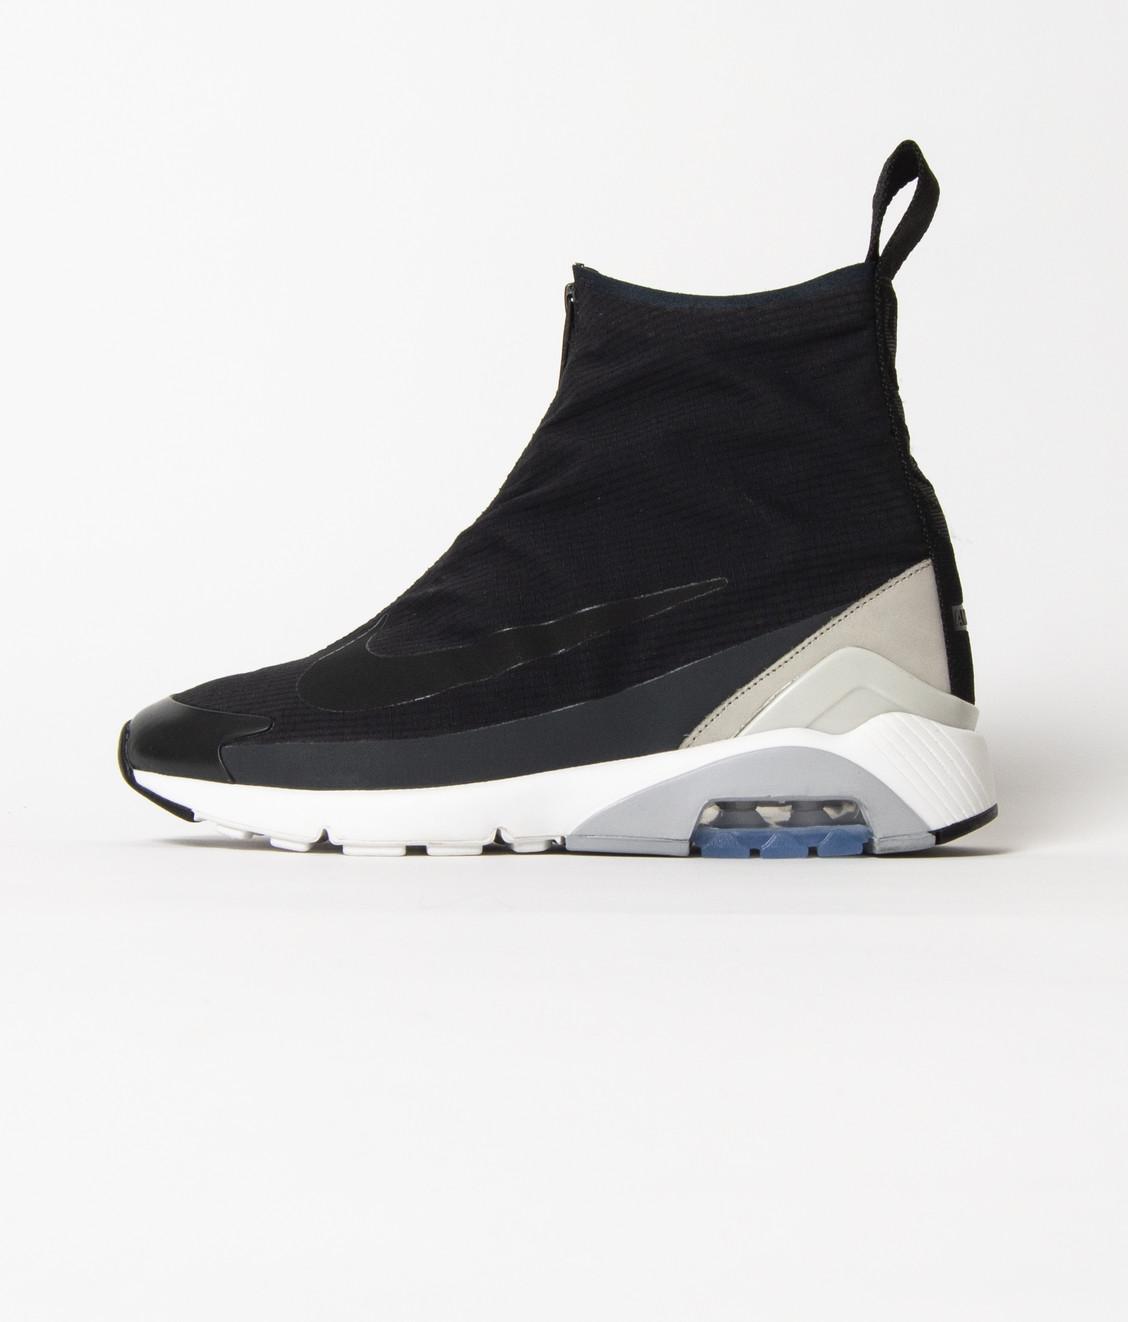 on sale 30339 0b0c4 Nike Nike X Ambush Air Max 180 High Black